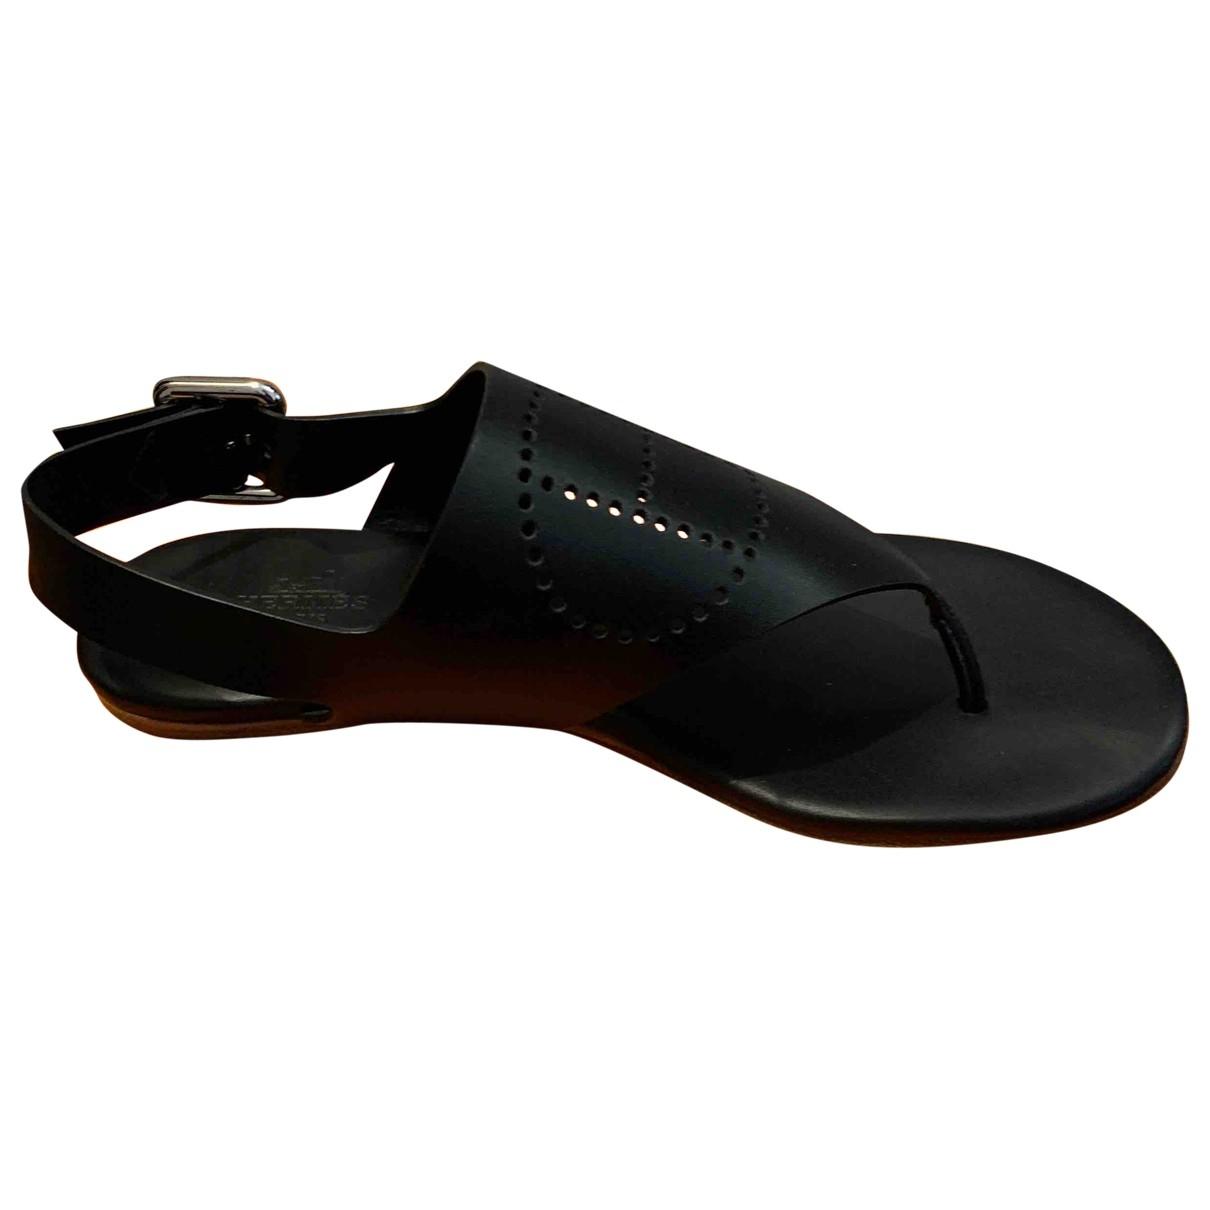 Hermès \N Black Leather Sandals for Women 36 EU